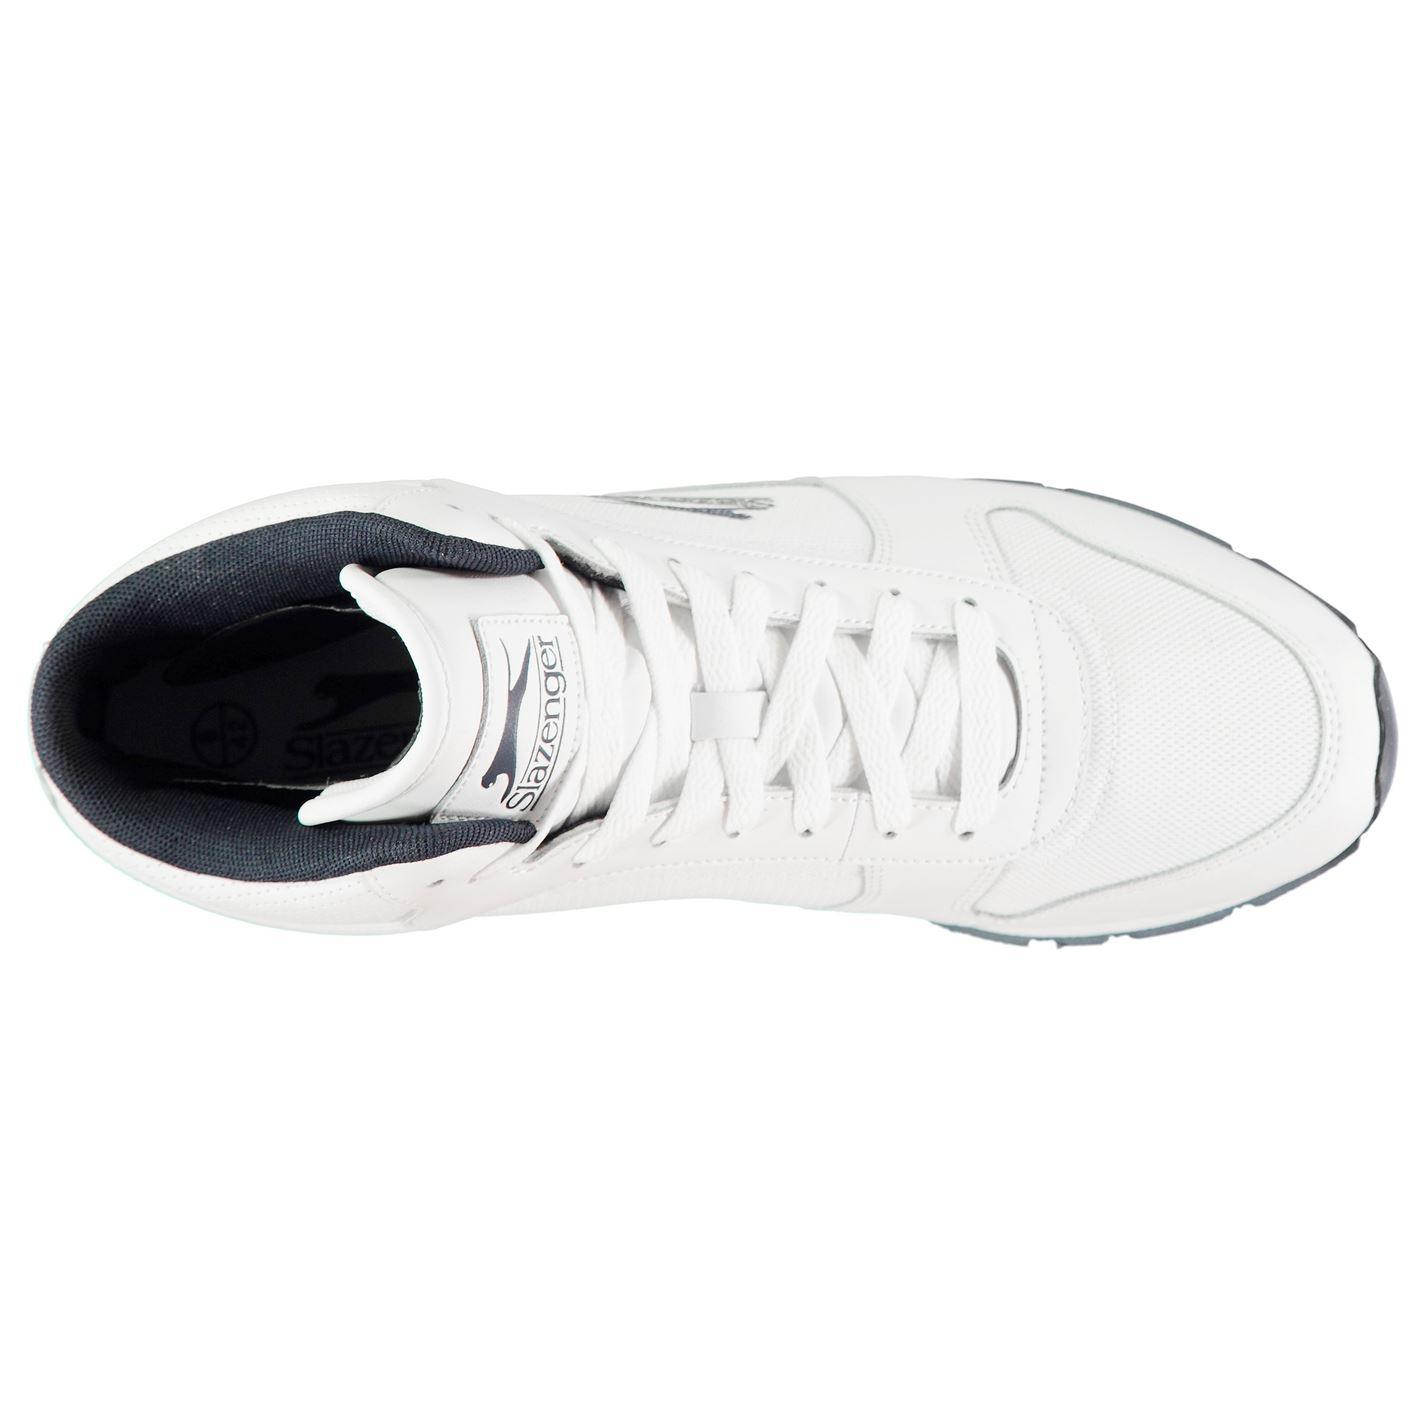 0ddb1e2084e Slazenger Mens Classic Hi Top Trainers Sports Shoes Lace Up Retro ...